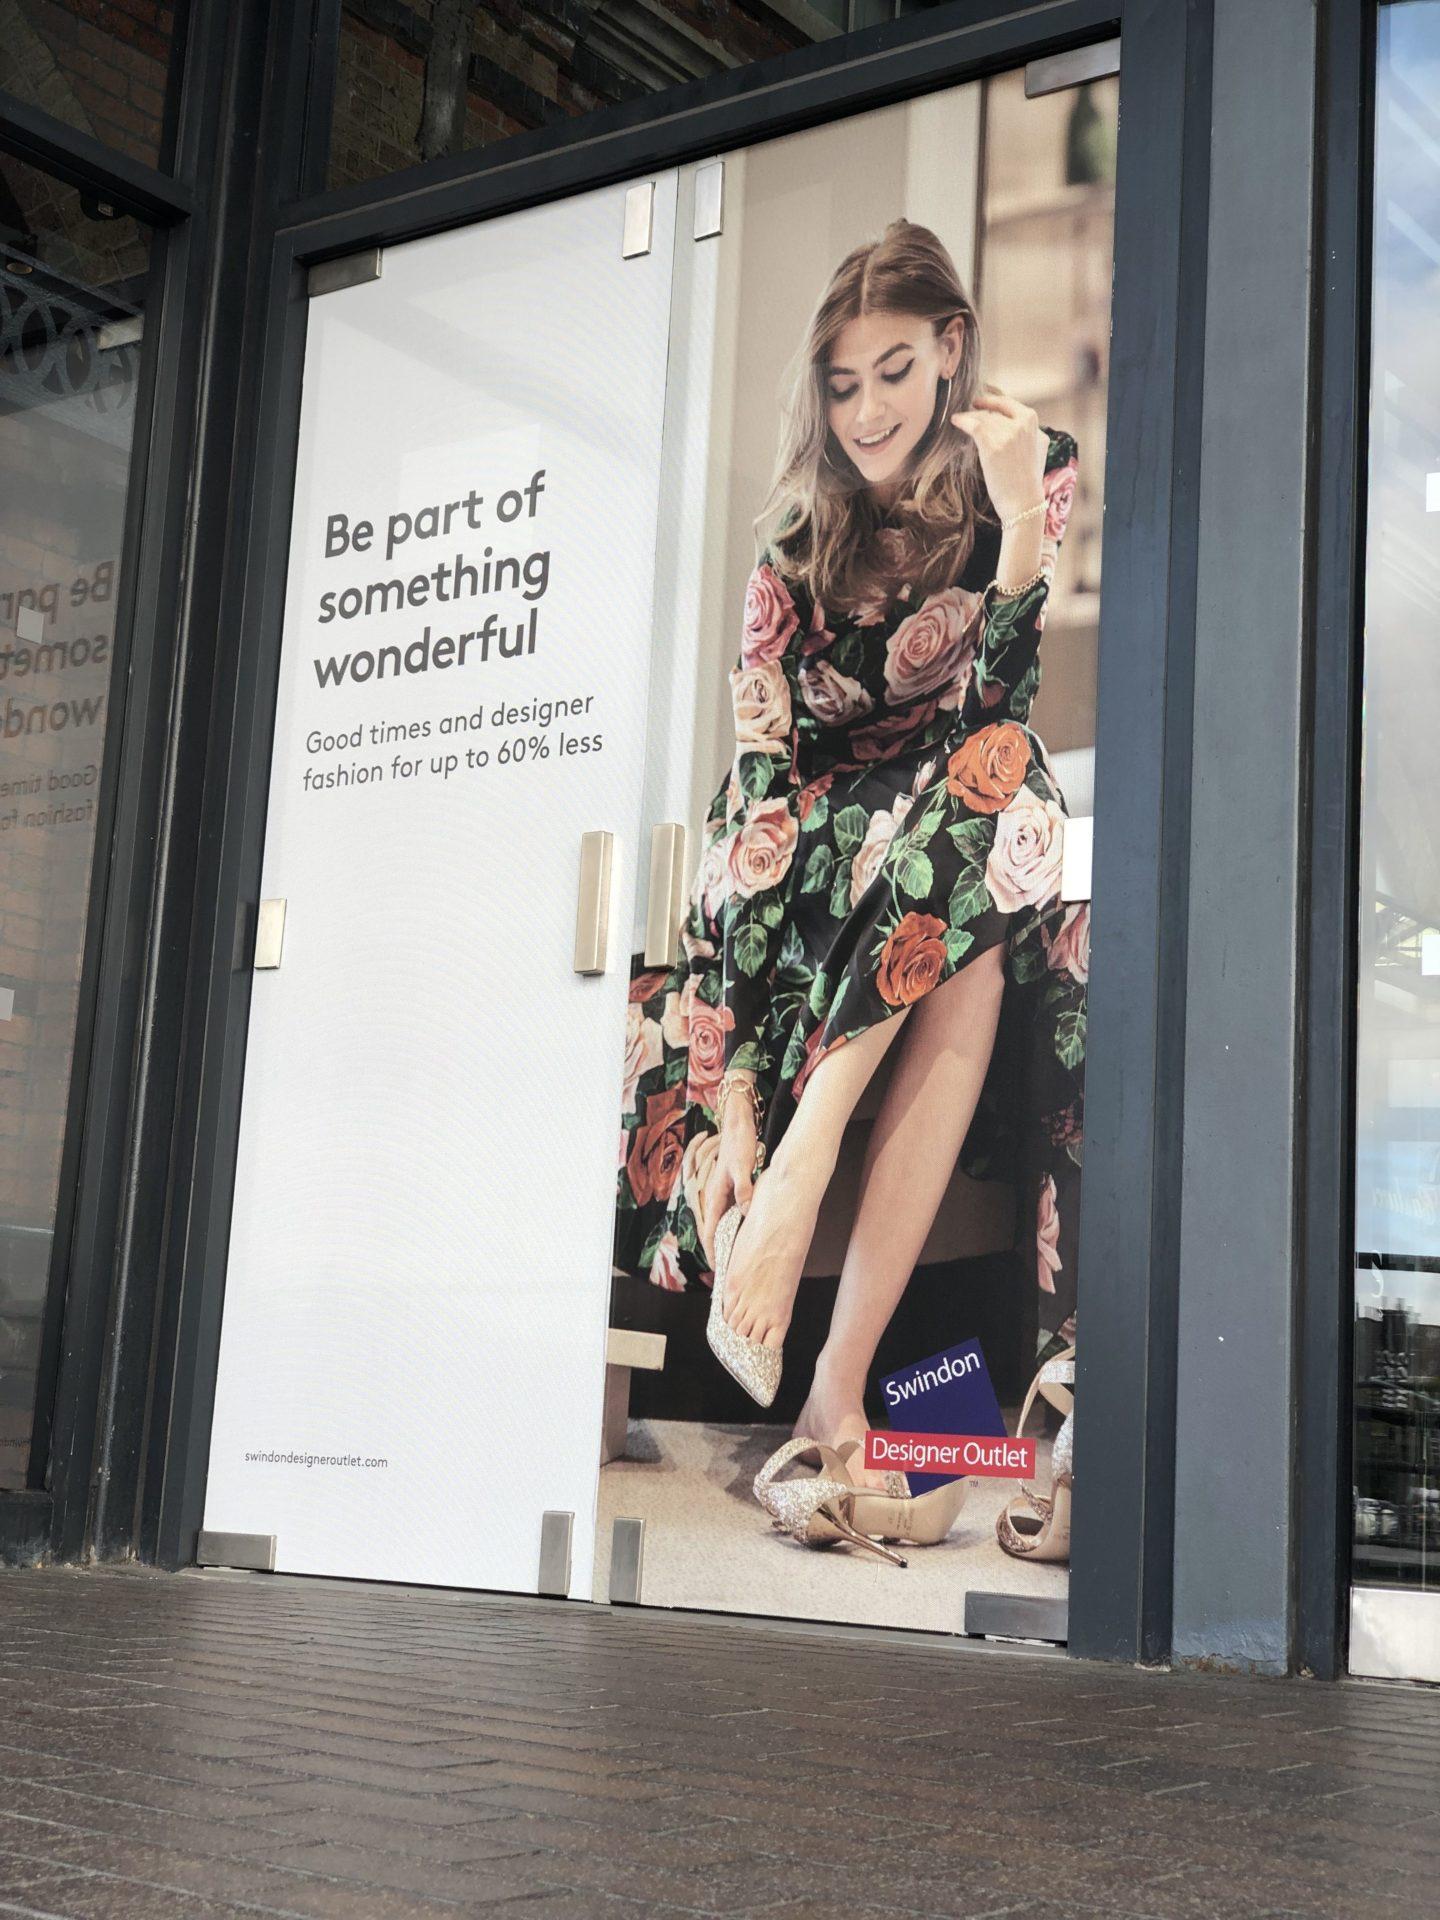 swindon-designer-outlet-uk-perforated-window-film